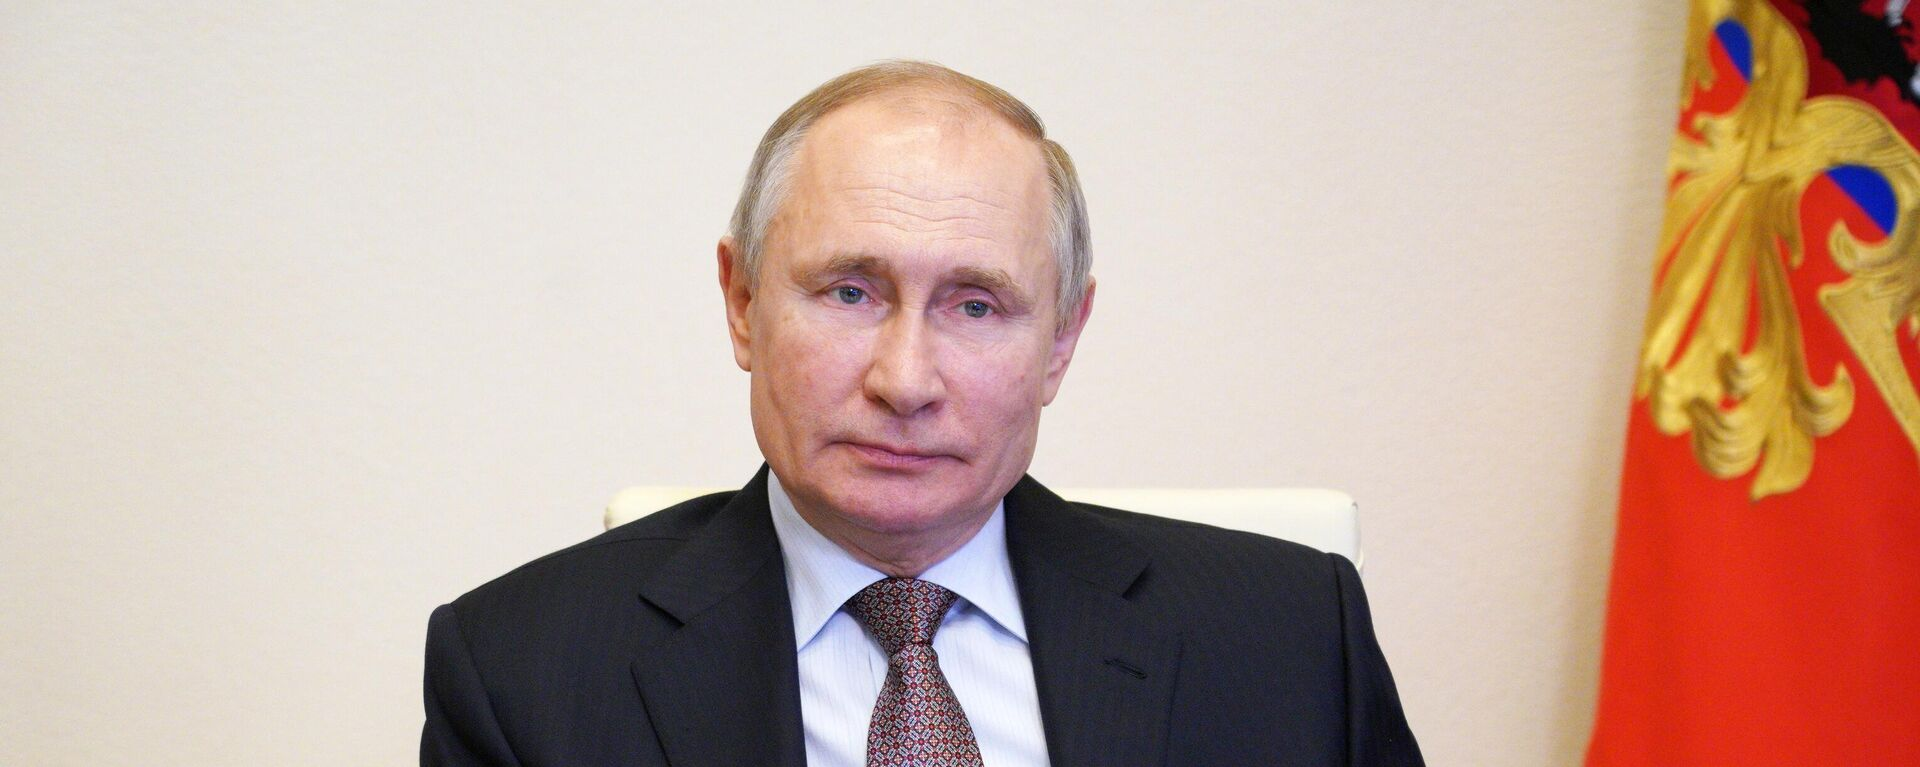 Vladímir Putin, presidente de Rusia - Sputnik Mundo, 1920, 21.07.2021